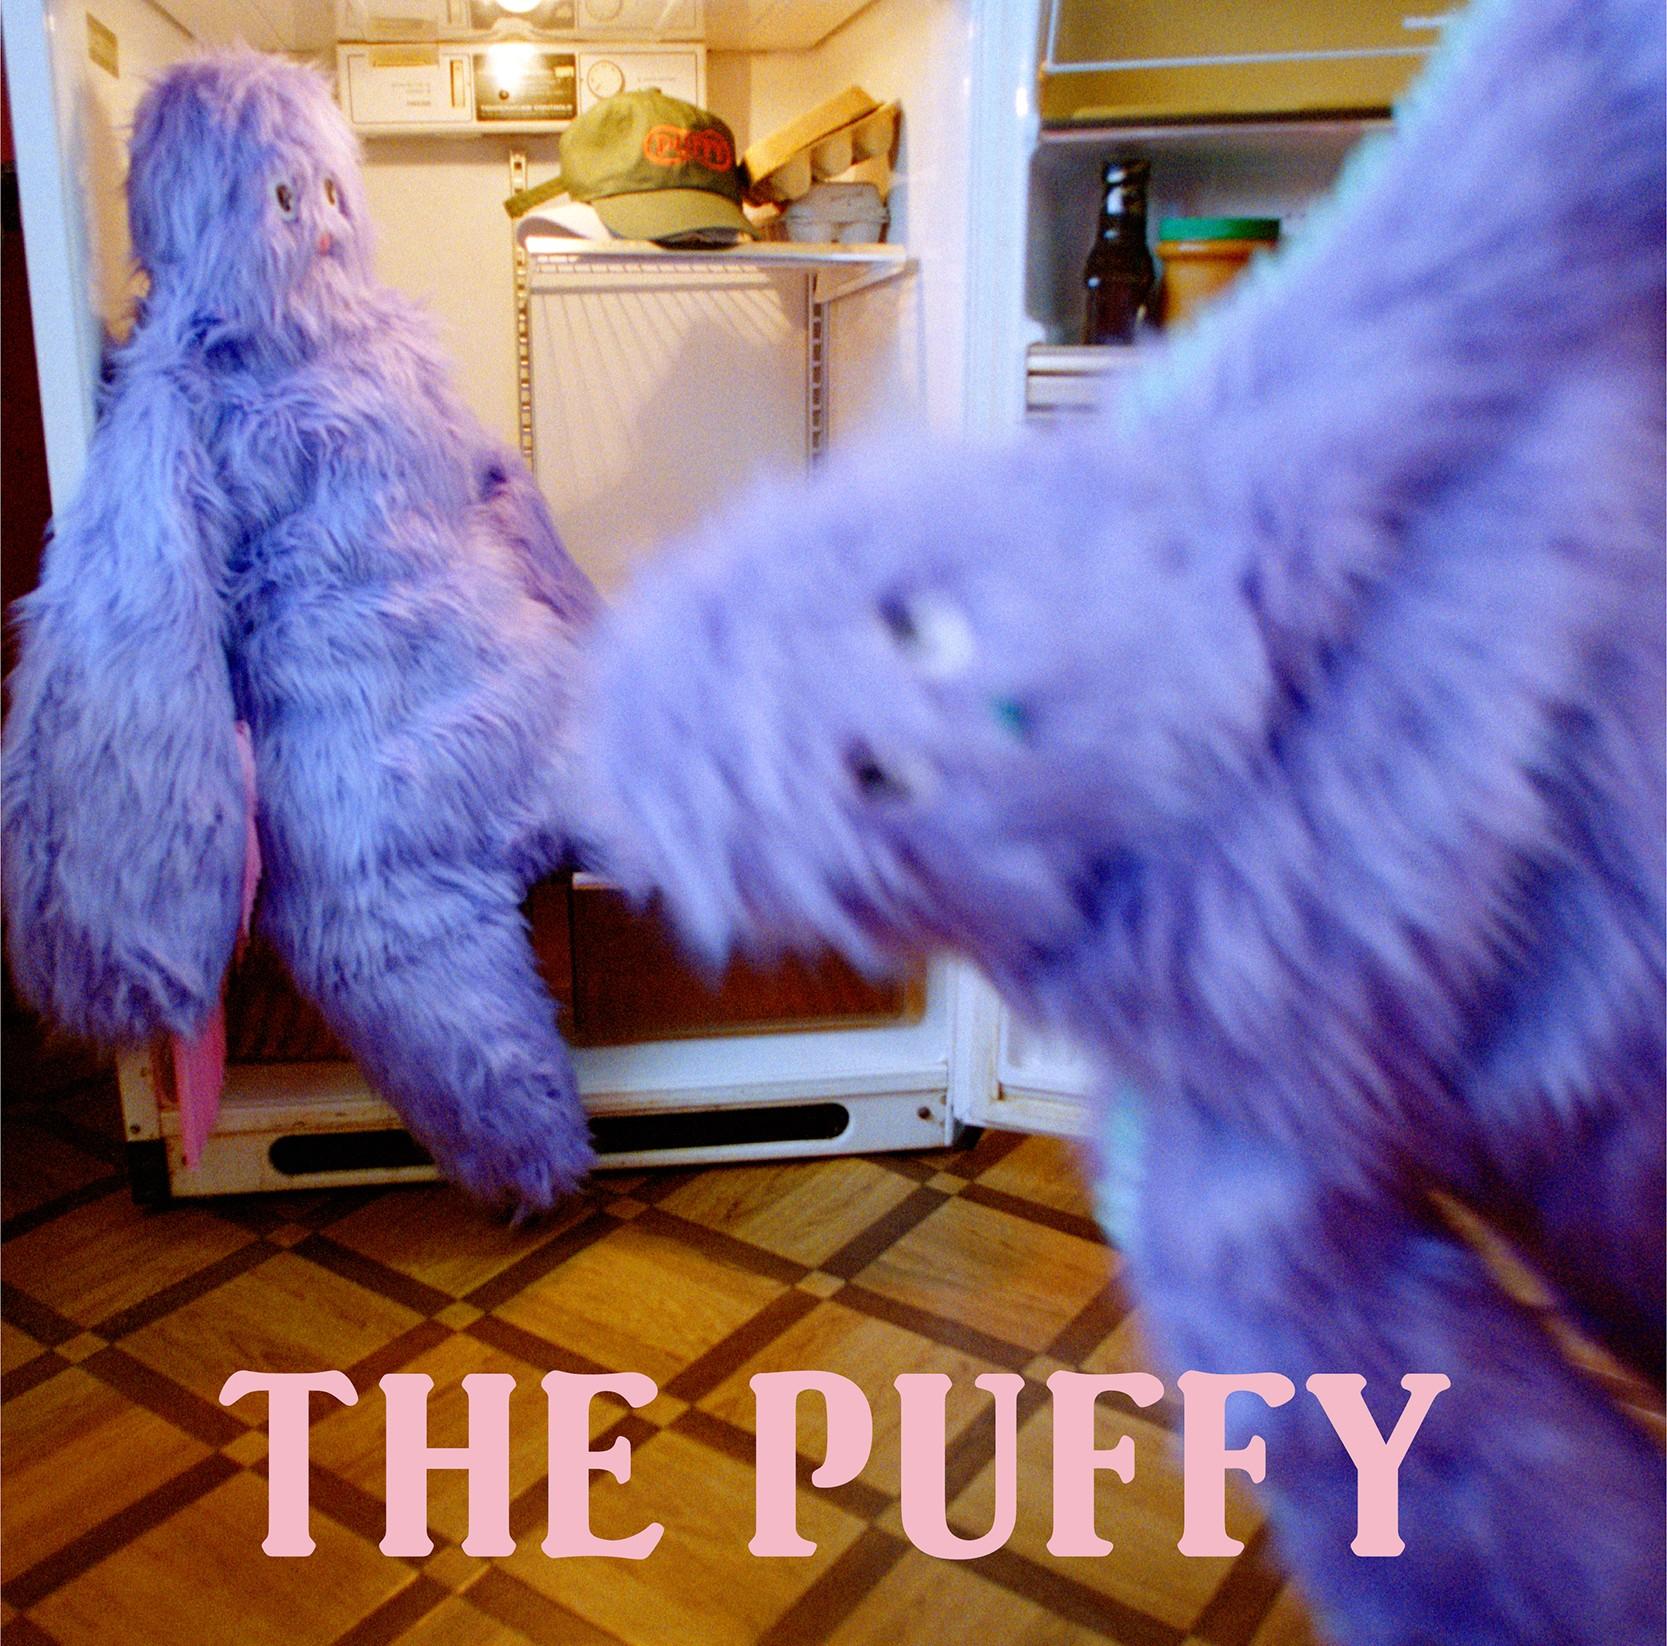 PUFFY – THE PUFFY [FLAC / WEB] [2021.09.22]